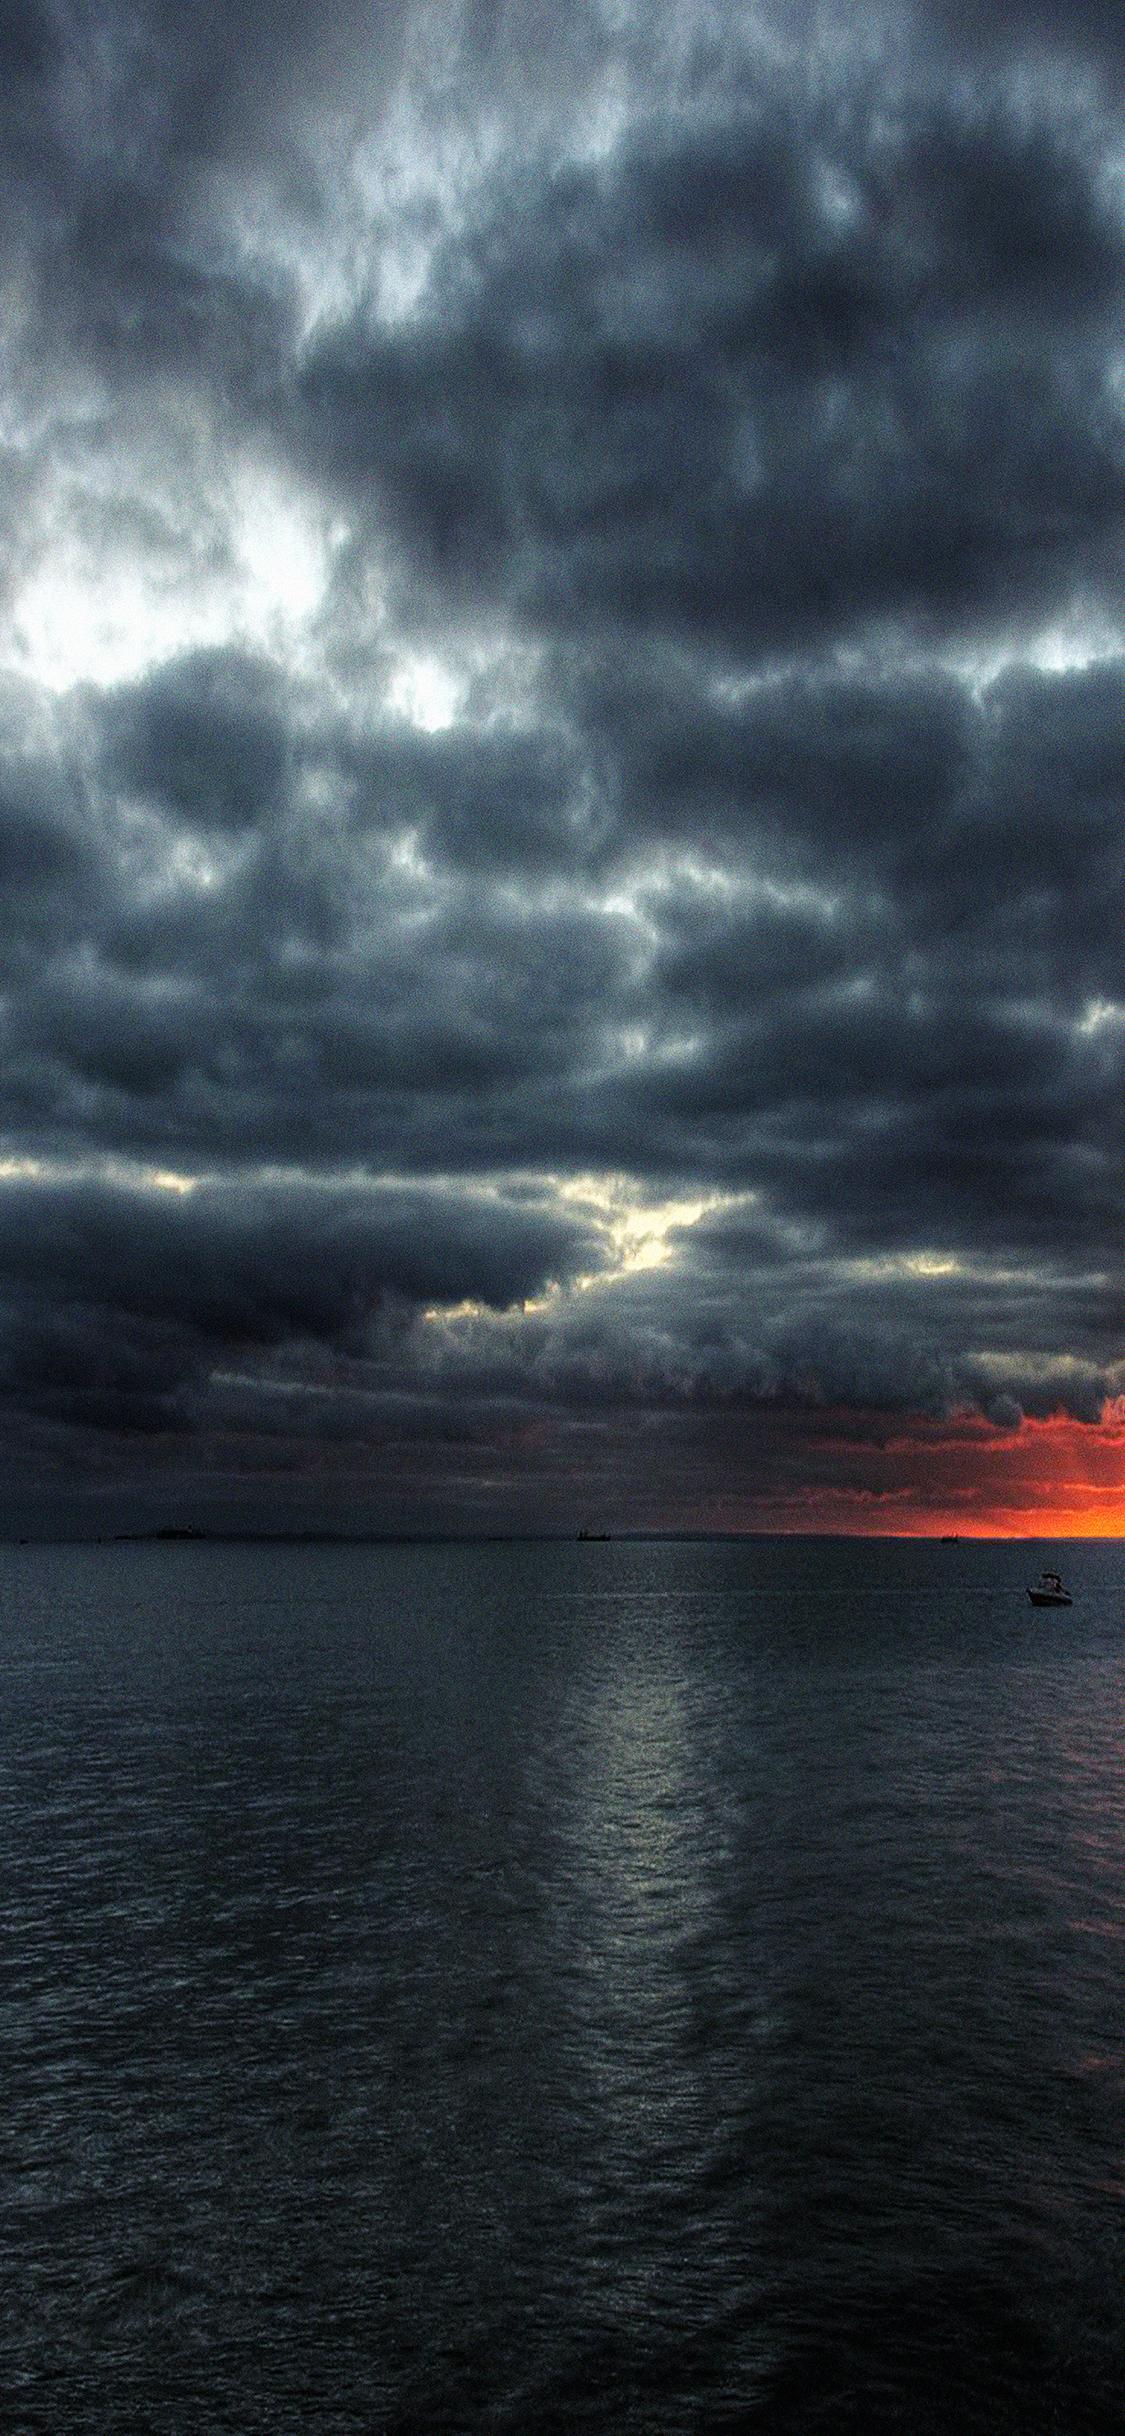 mc60-wallpaper-dark-sea-storm-night-ocean - Papers.co